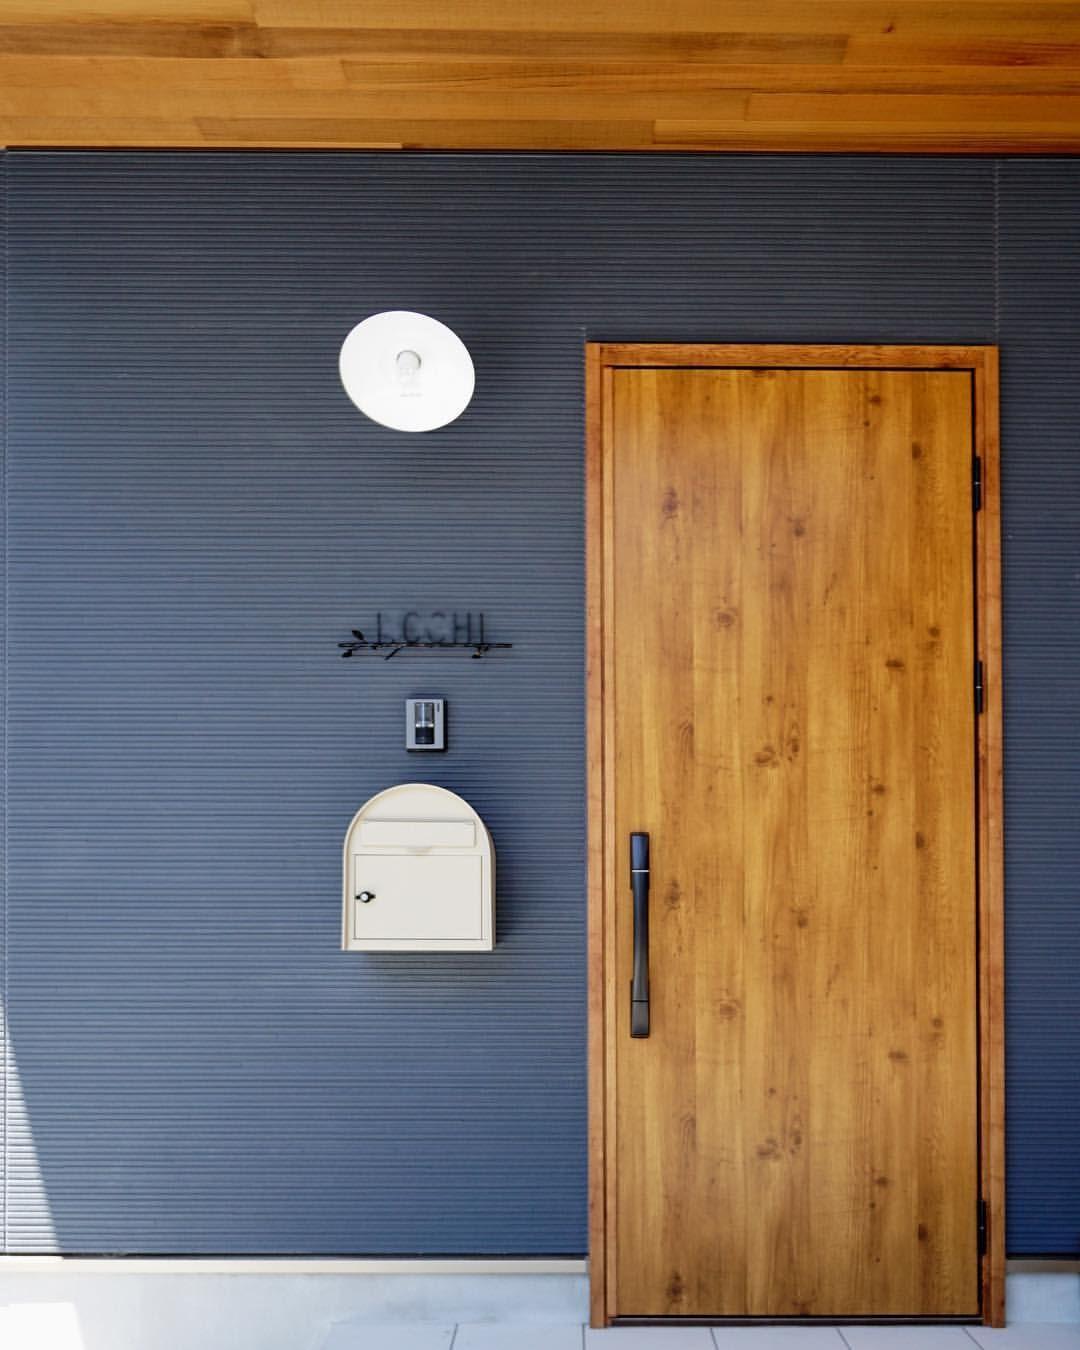 Hibiki Livingd 第一建設 玄関 レッドシダー ポスト 現代的な